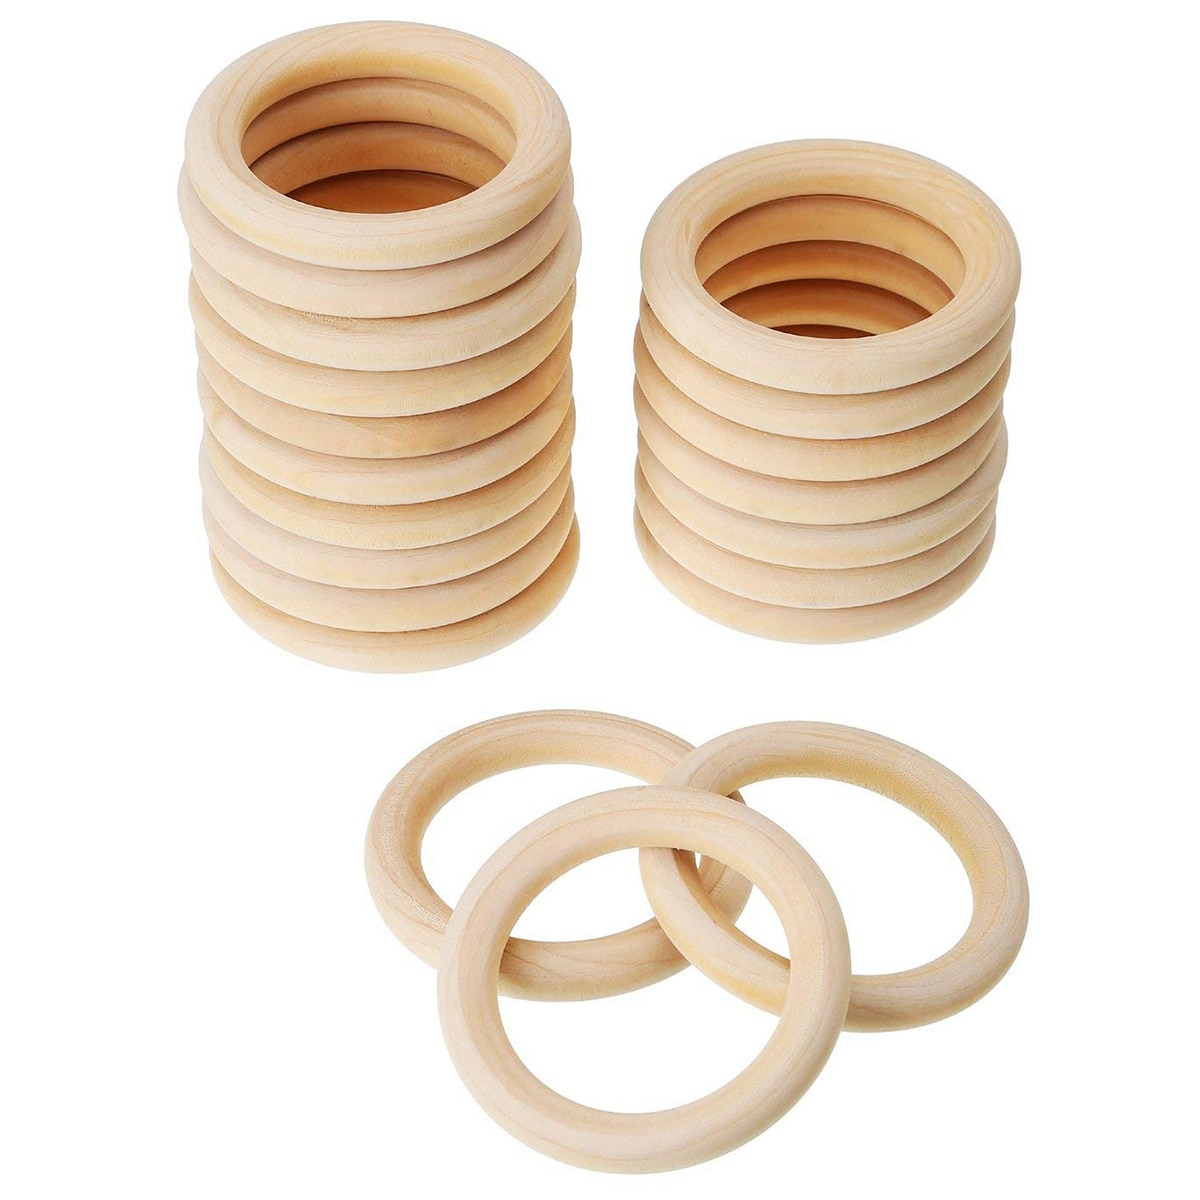 Paquete de 20 anillos de madera, anillos de madera para manualidades, colgantes de anillo y conectores para fabricación de joyas de 70mm